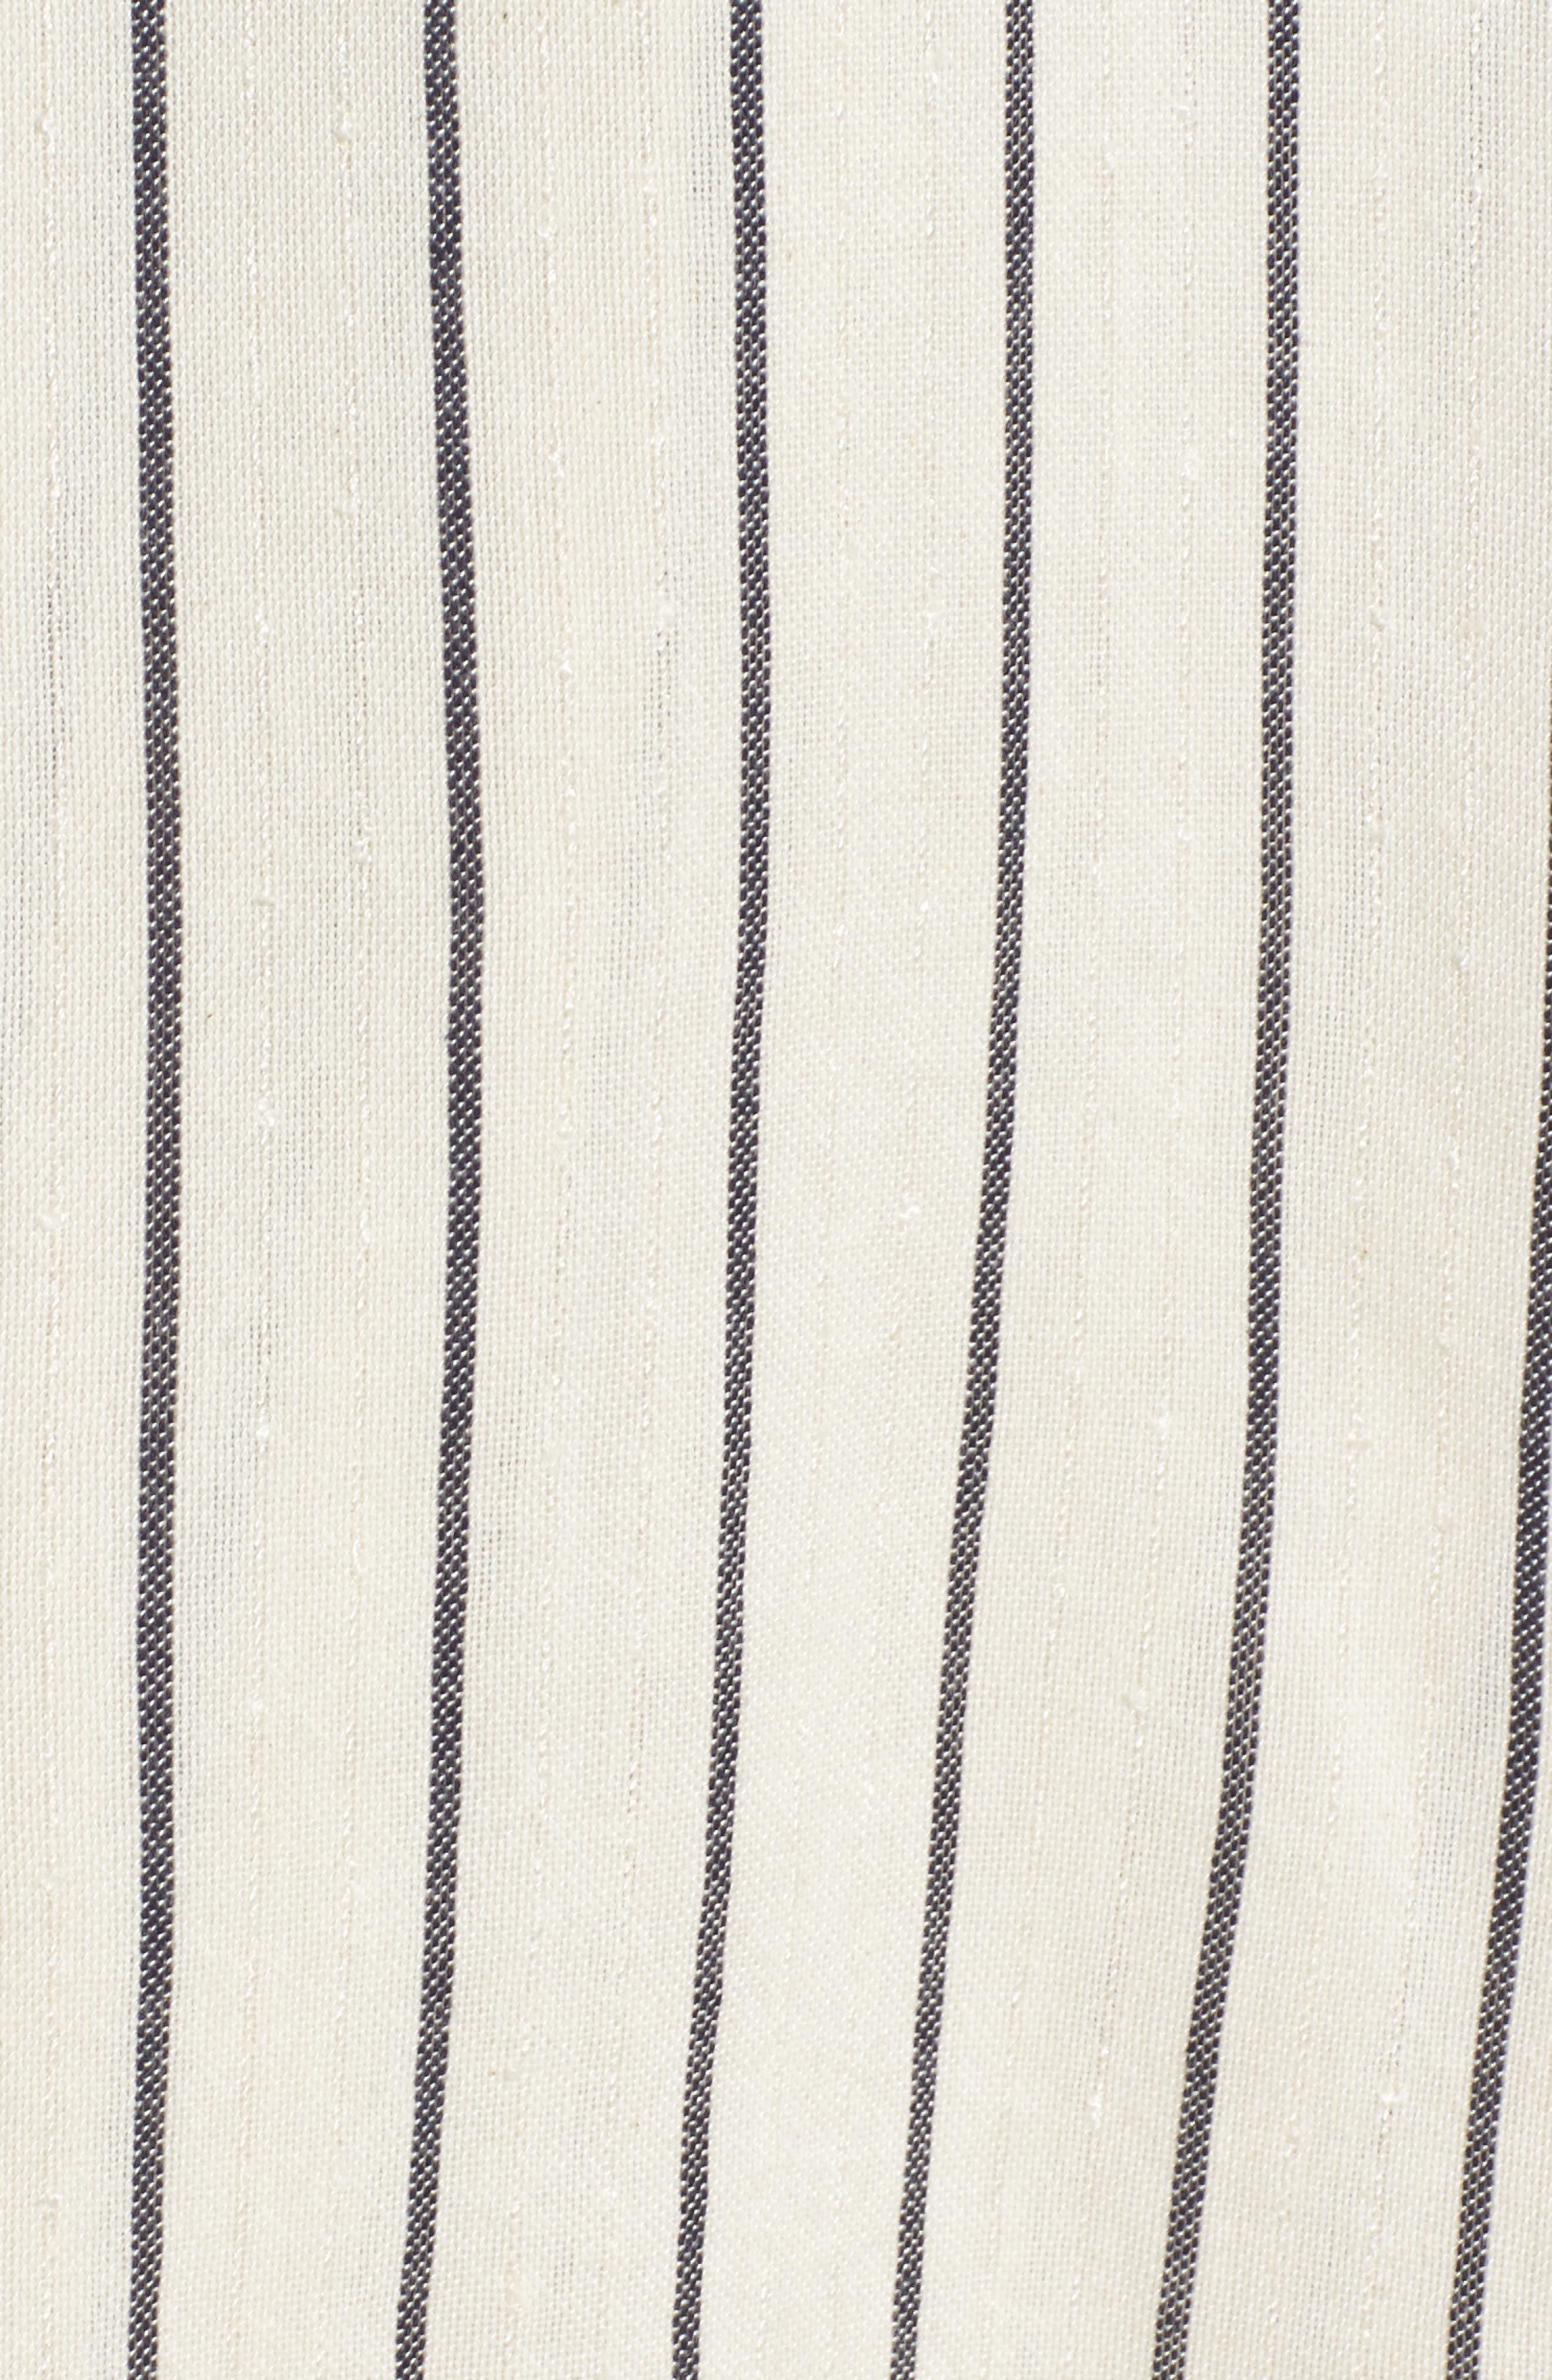 Robe Life Striped Midi Dress,                             Alternate thumbnail 5, color,                             Cool Wip